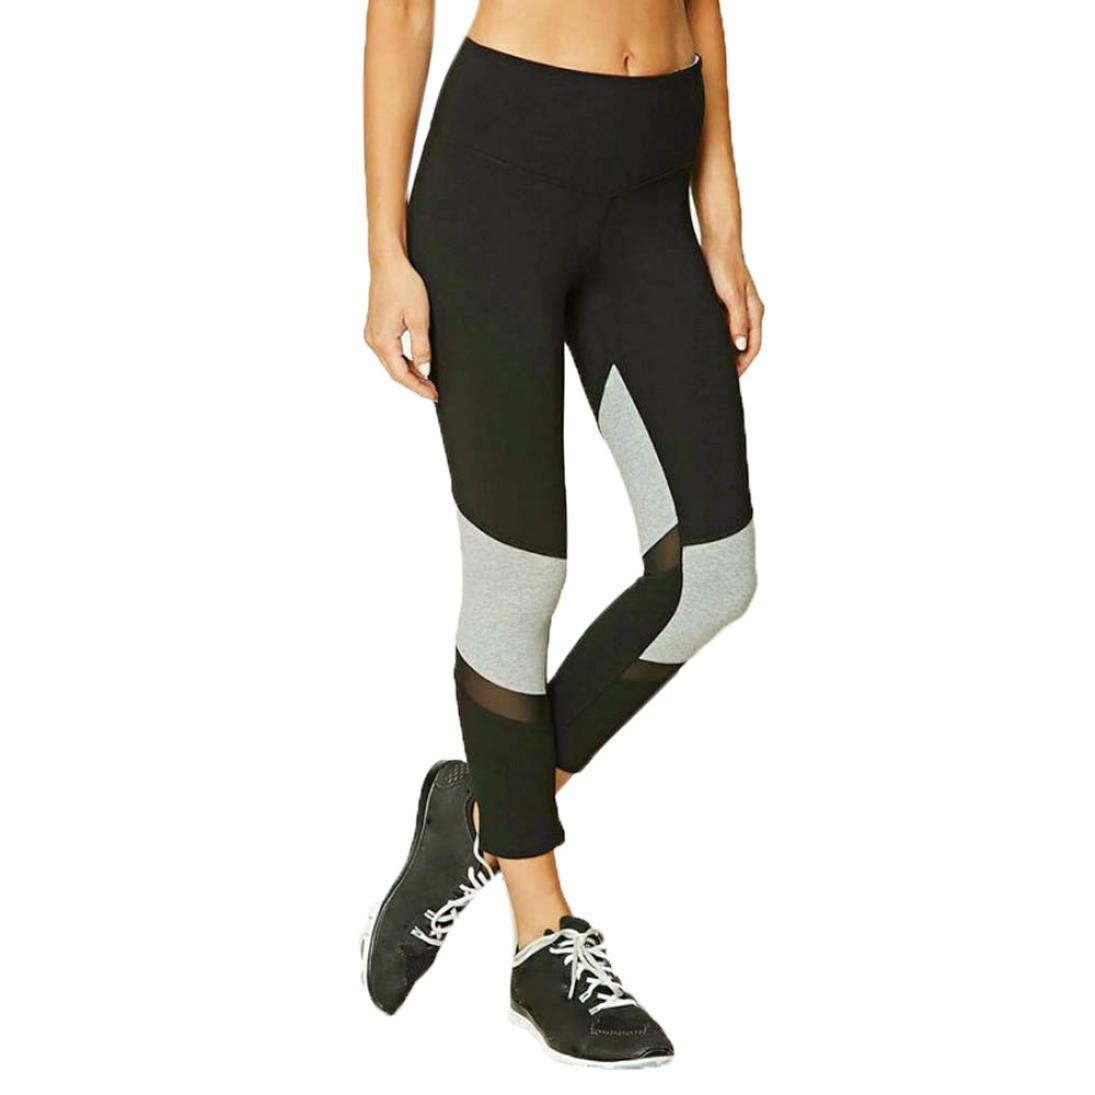 Leedford Women Leggings, Yoga Pants For Women Fitness Mesh Patchwork Workout Leggings Winter Yoga Capris (XL, Black)